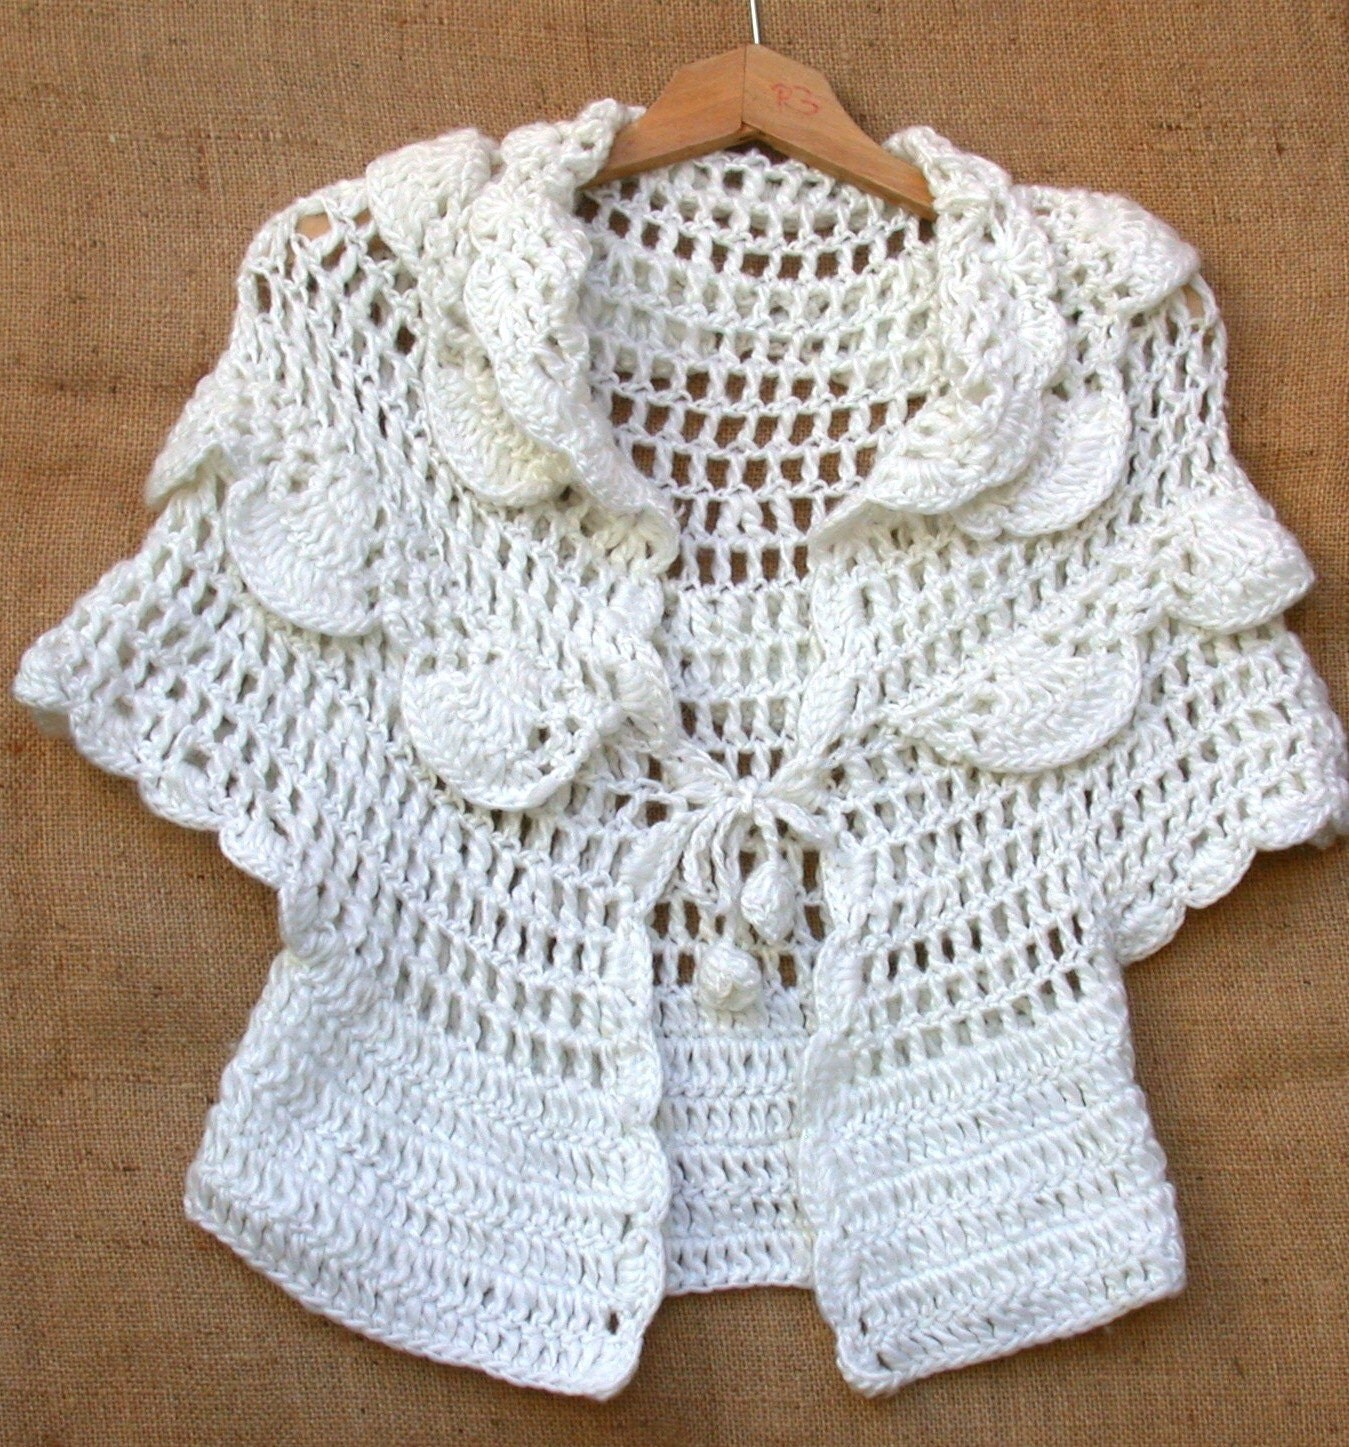 Crochet tops patterns, Crochet sweater patterns